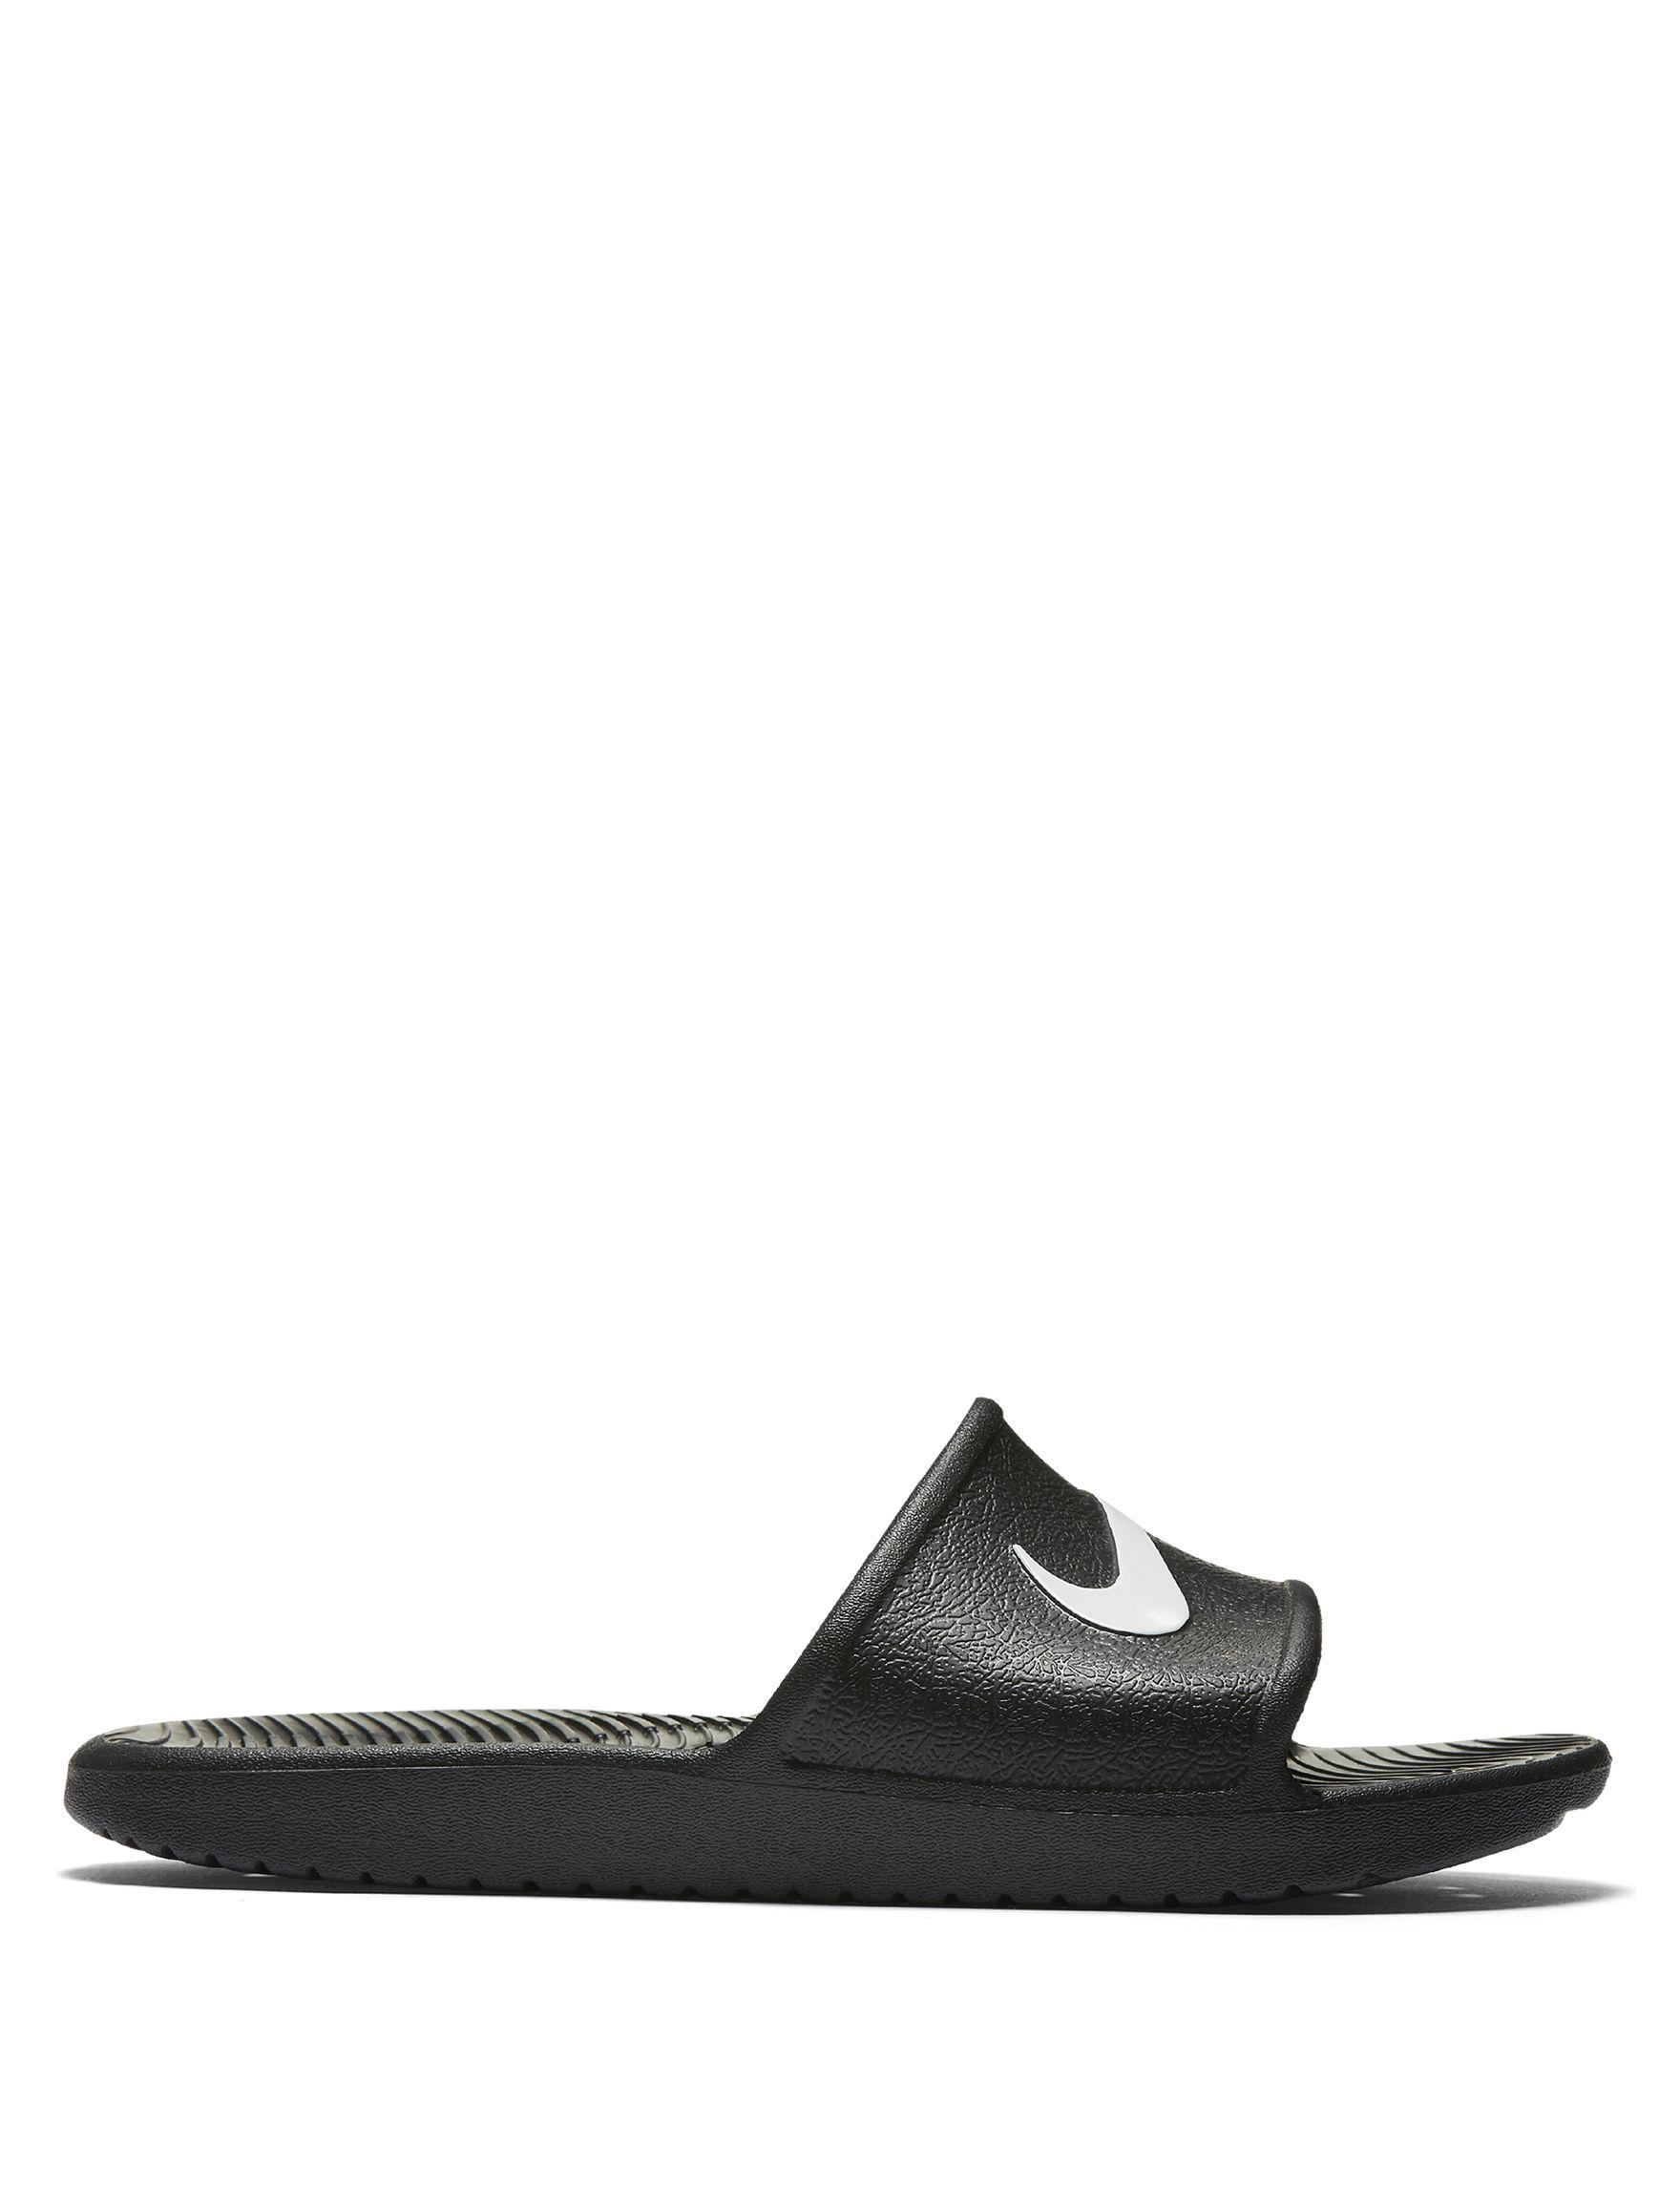 c86983bd7 Nike Kawa Shower Slide Sandals